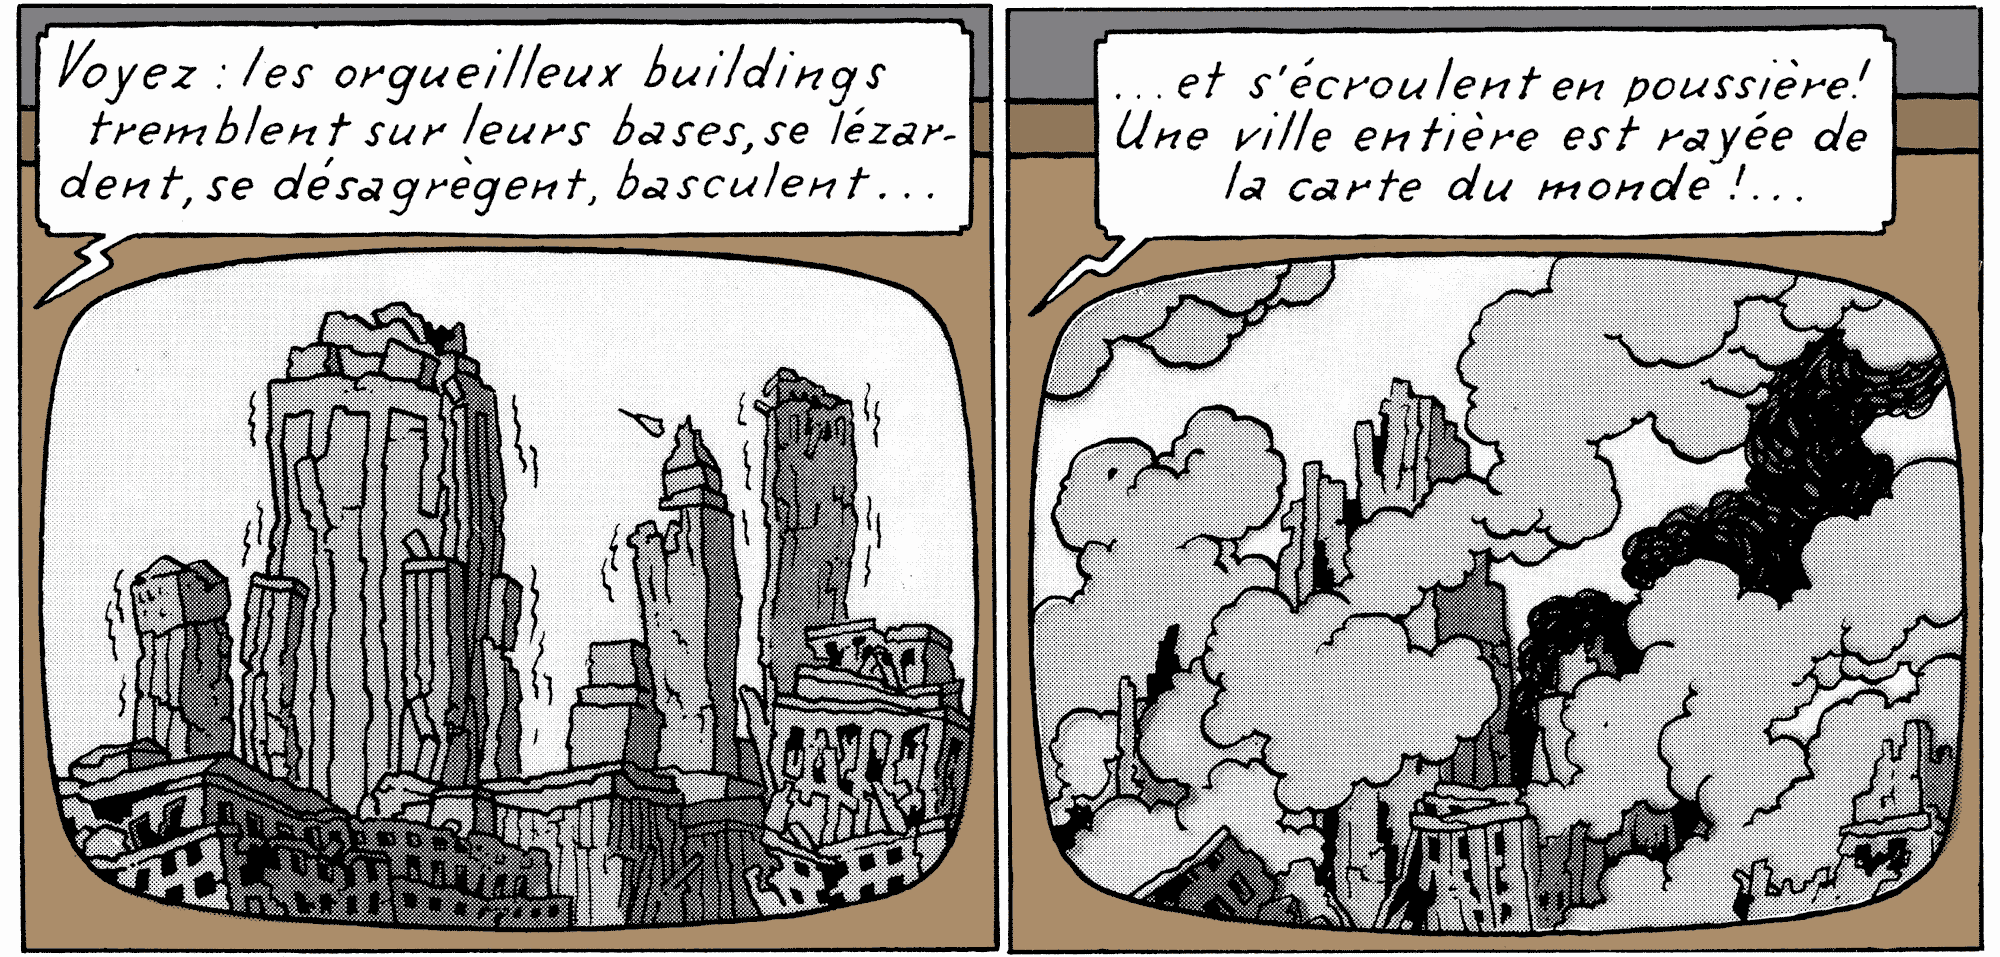 Tintin - Les Aventures de Tintin - L'affaire Tournesol